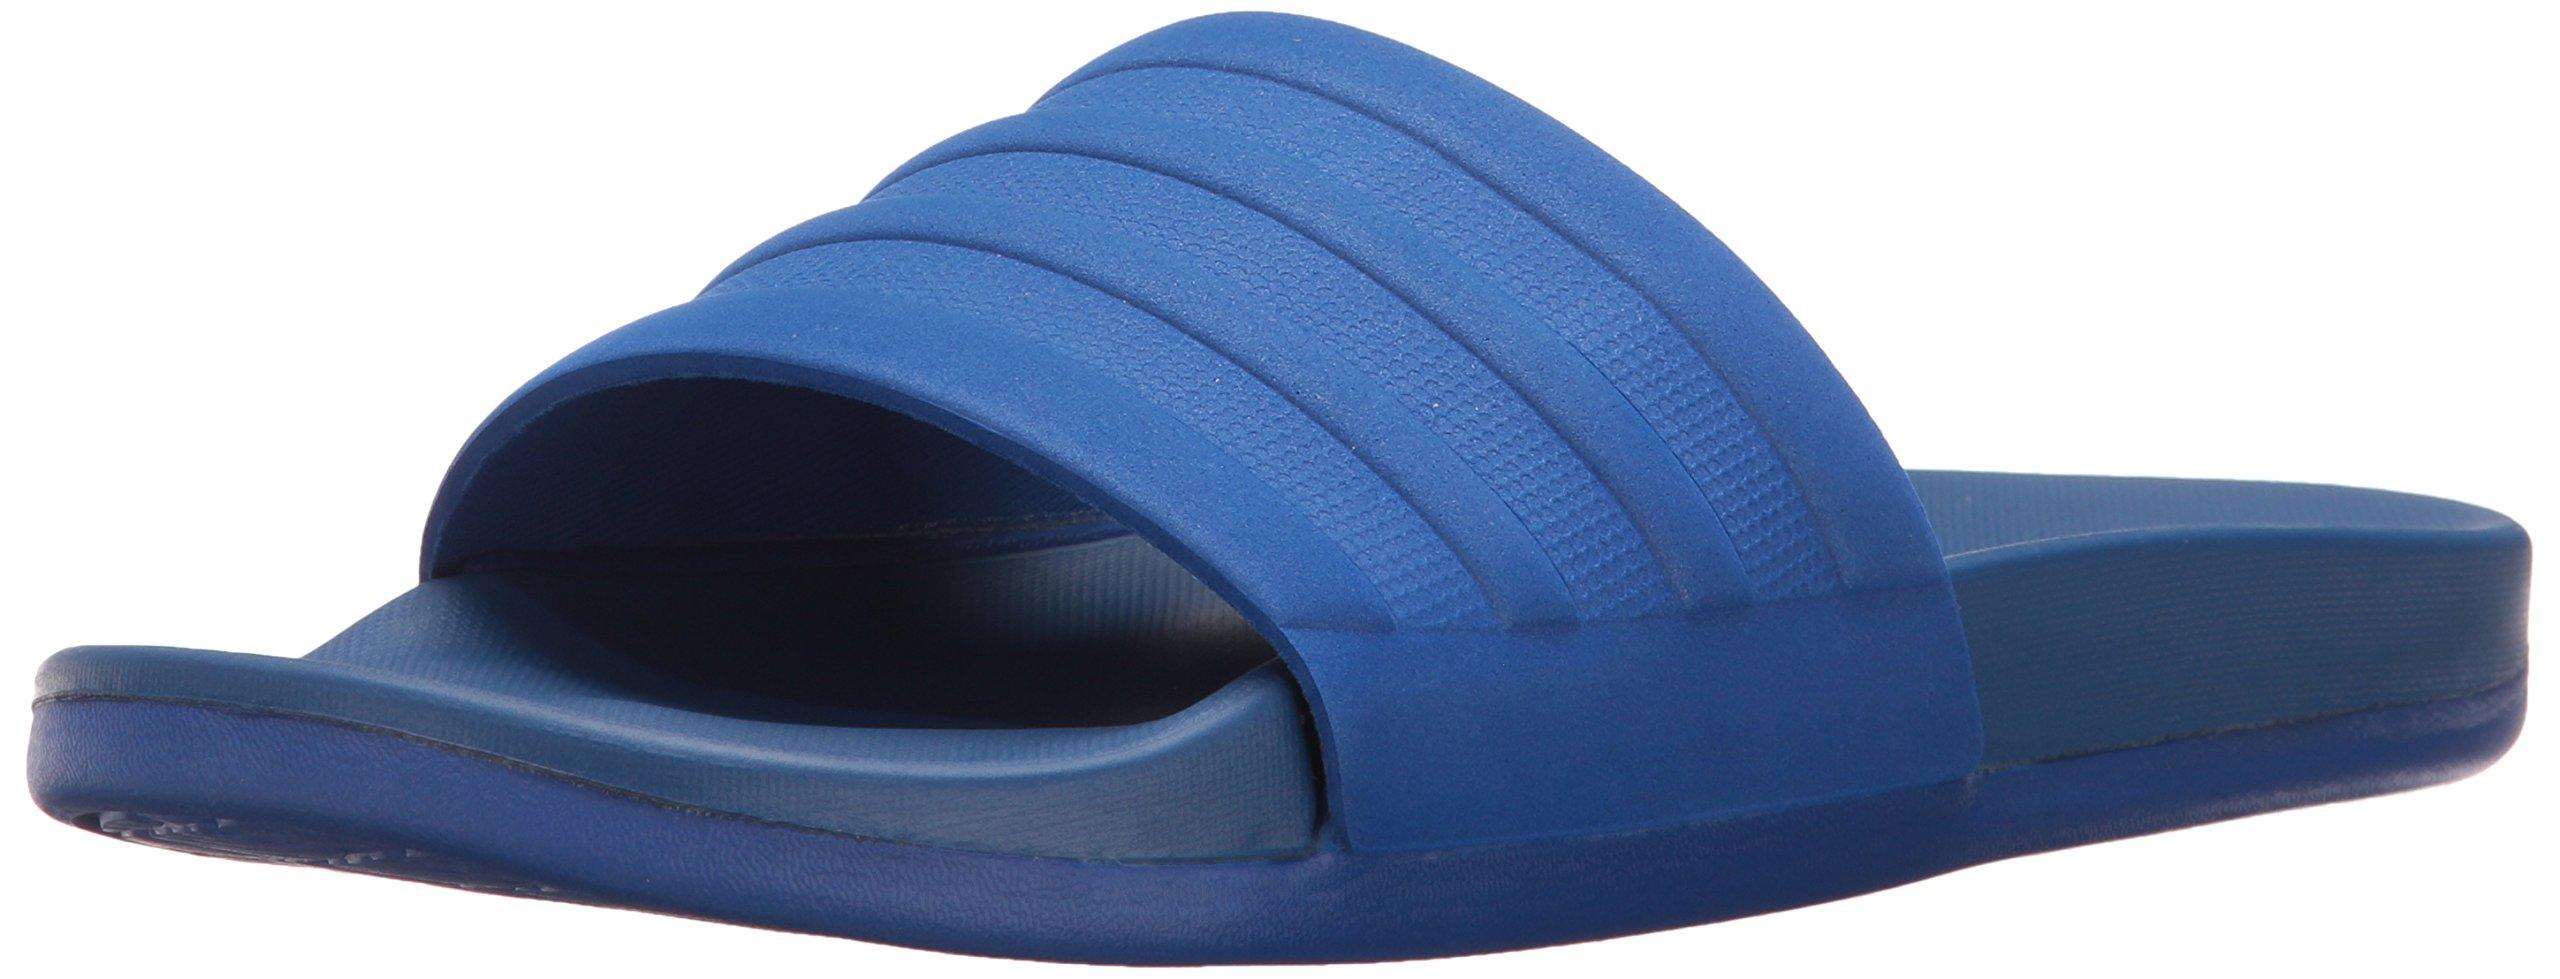 adidas Men's Adilette CF+ Mono Slide Sandals, Collegiate Royal/Collegiate Royal/Collegiate Royal, (8 M US) by adidas